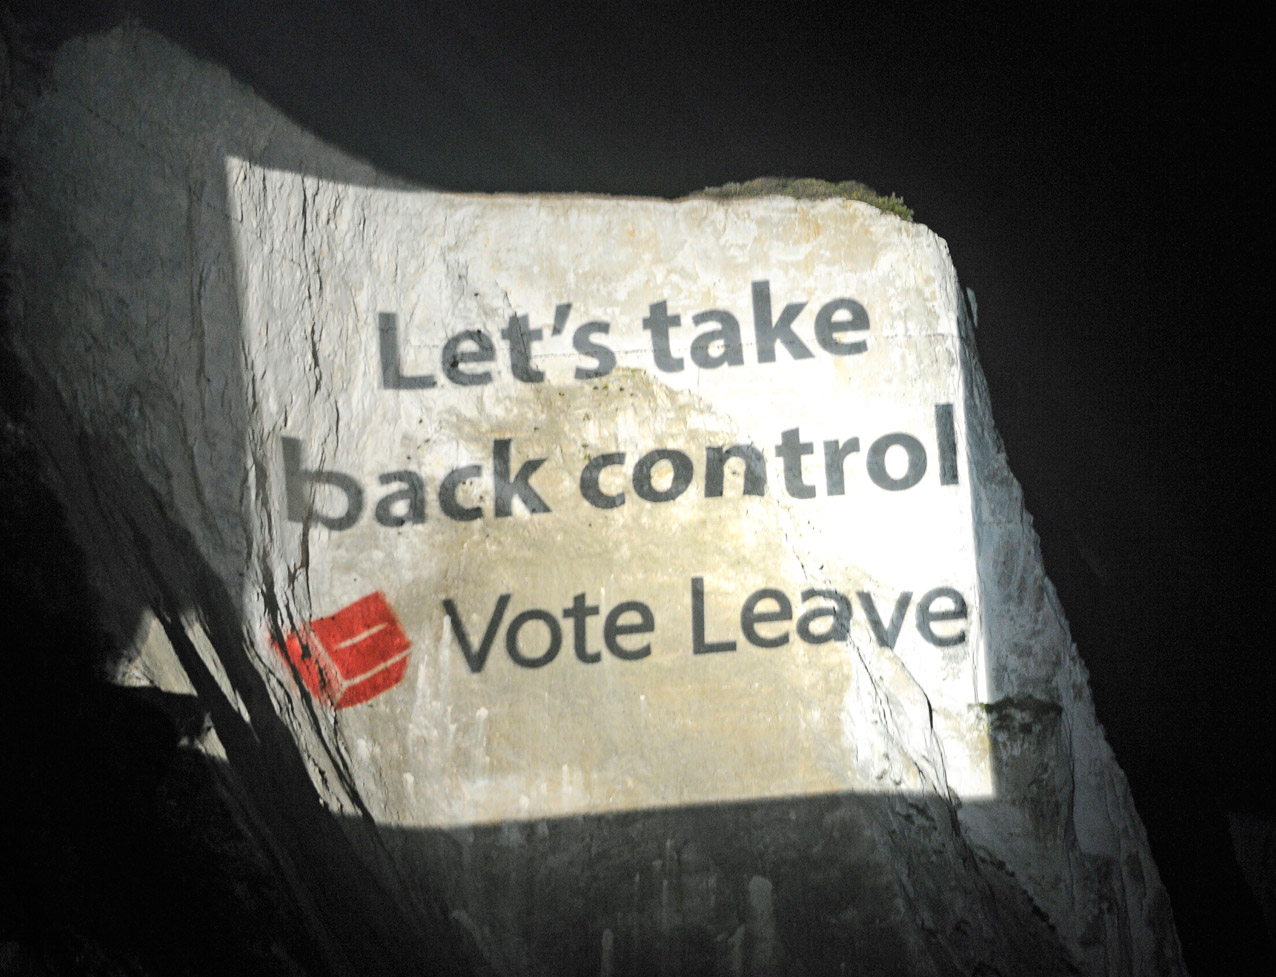 2016-11-no1-lets-take-back-control-dover-cliffs